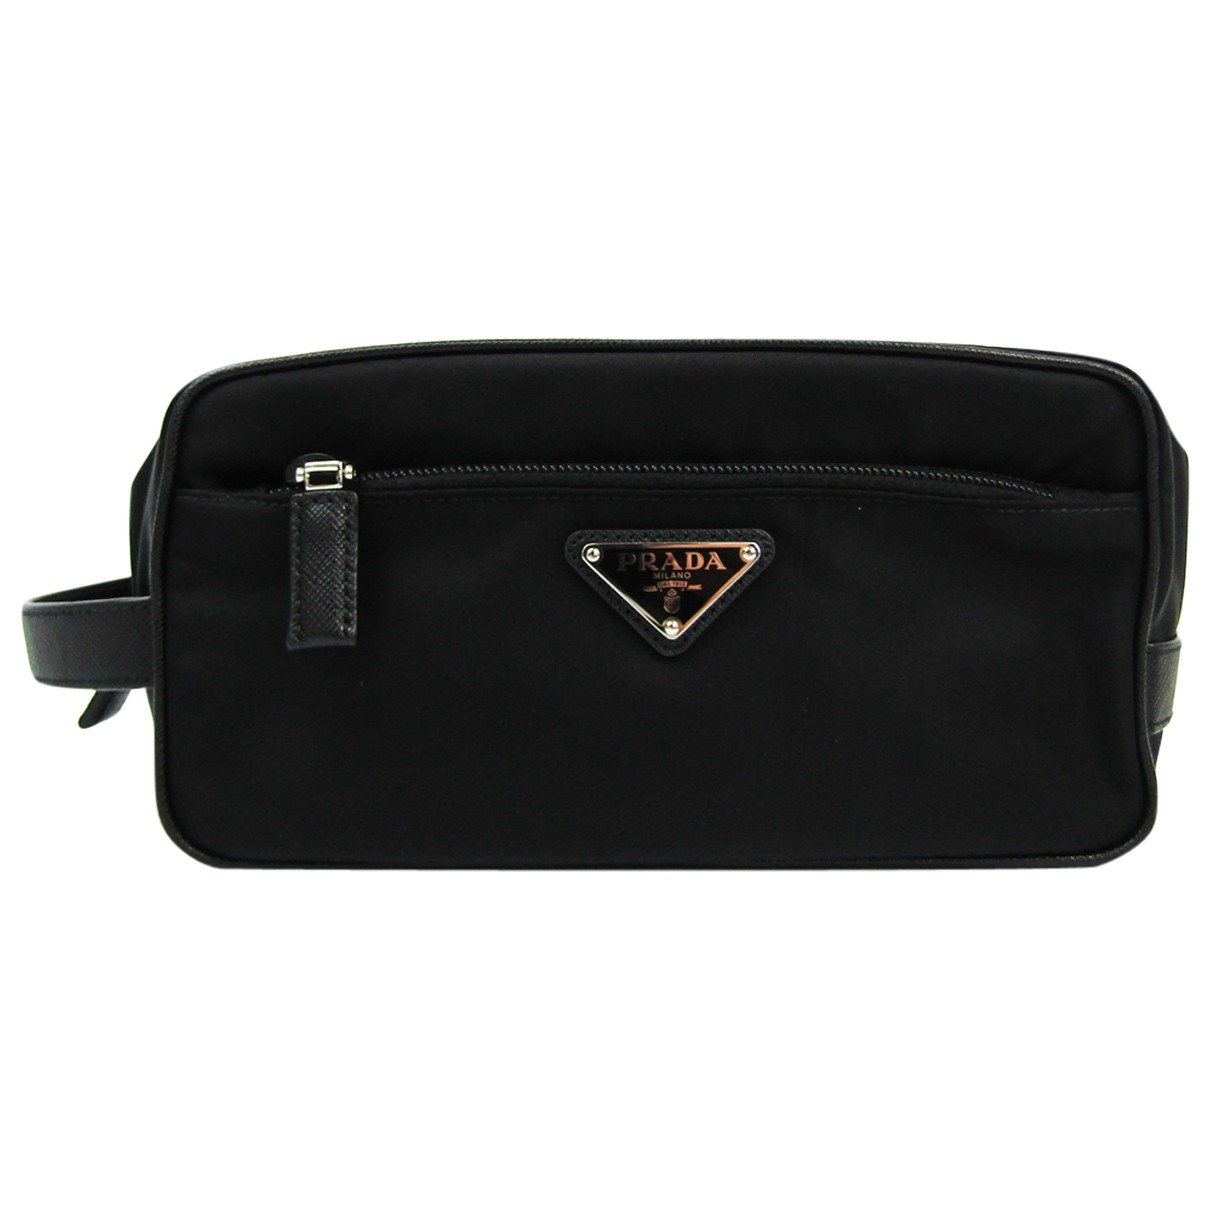 Prada N Black Leather bag for Men N